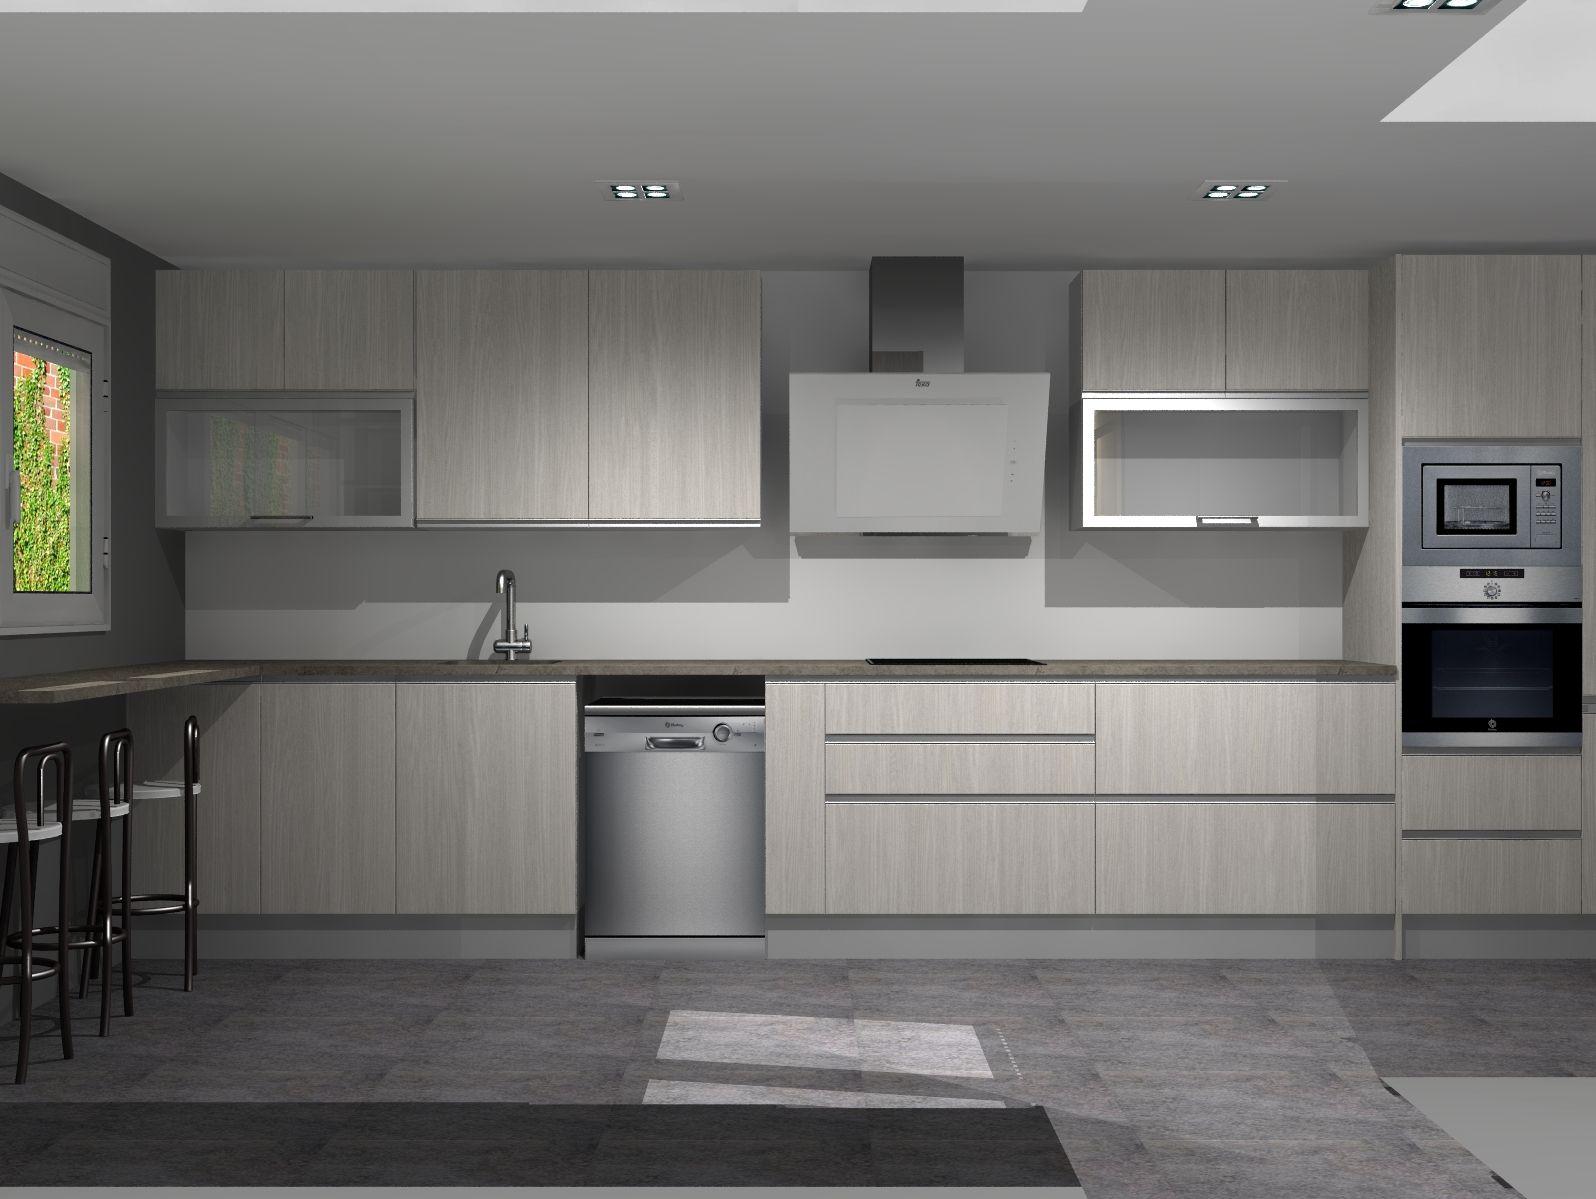 Muebles de cocina financiación 12 meses